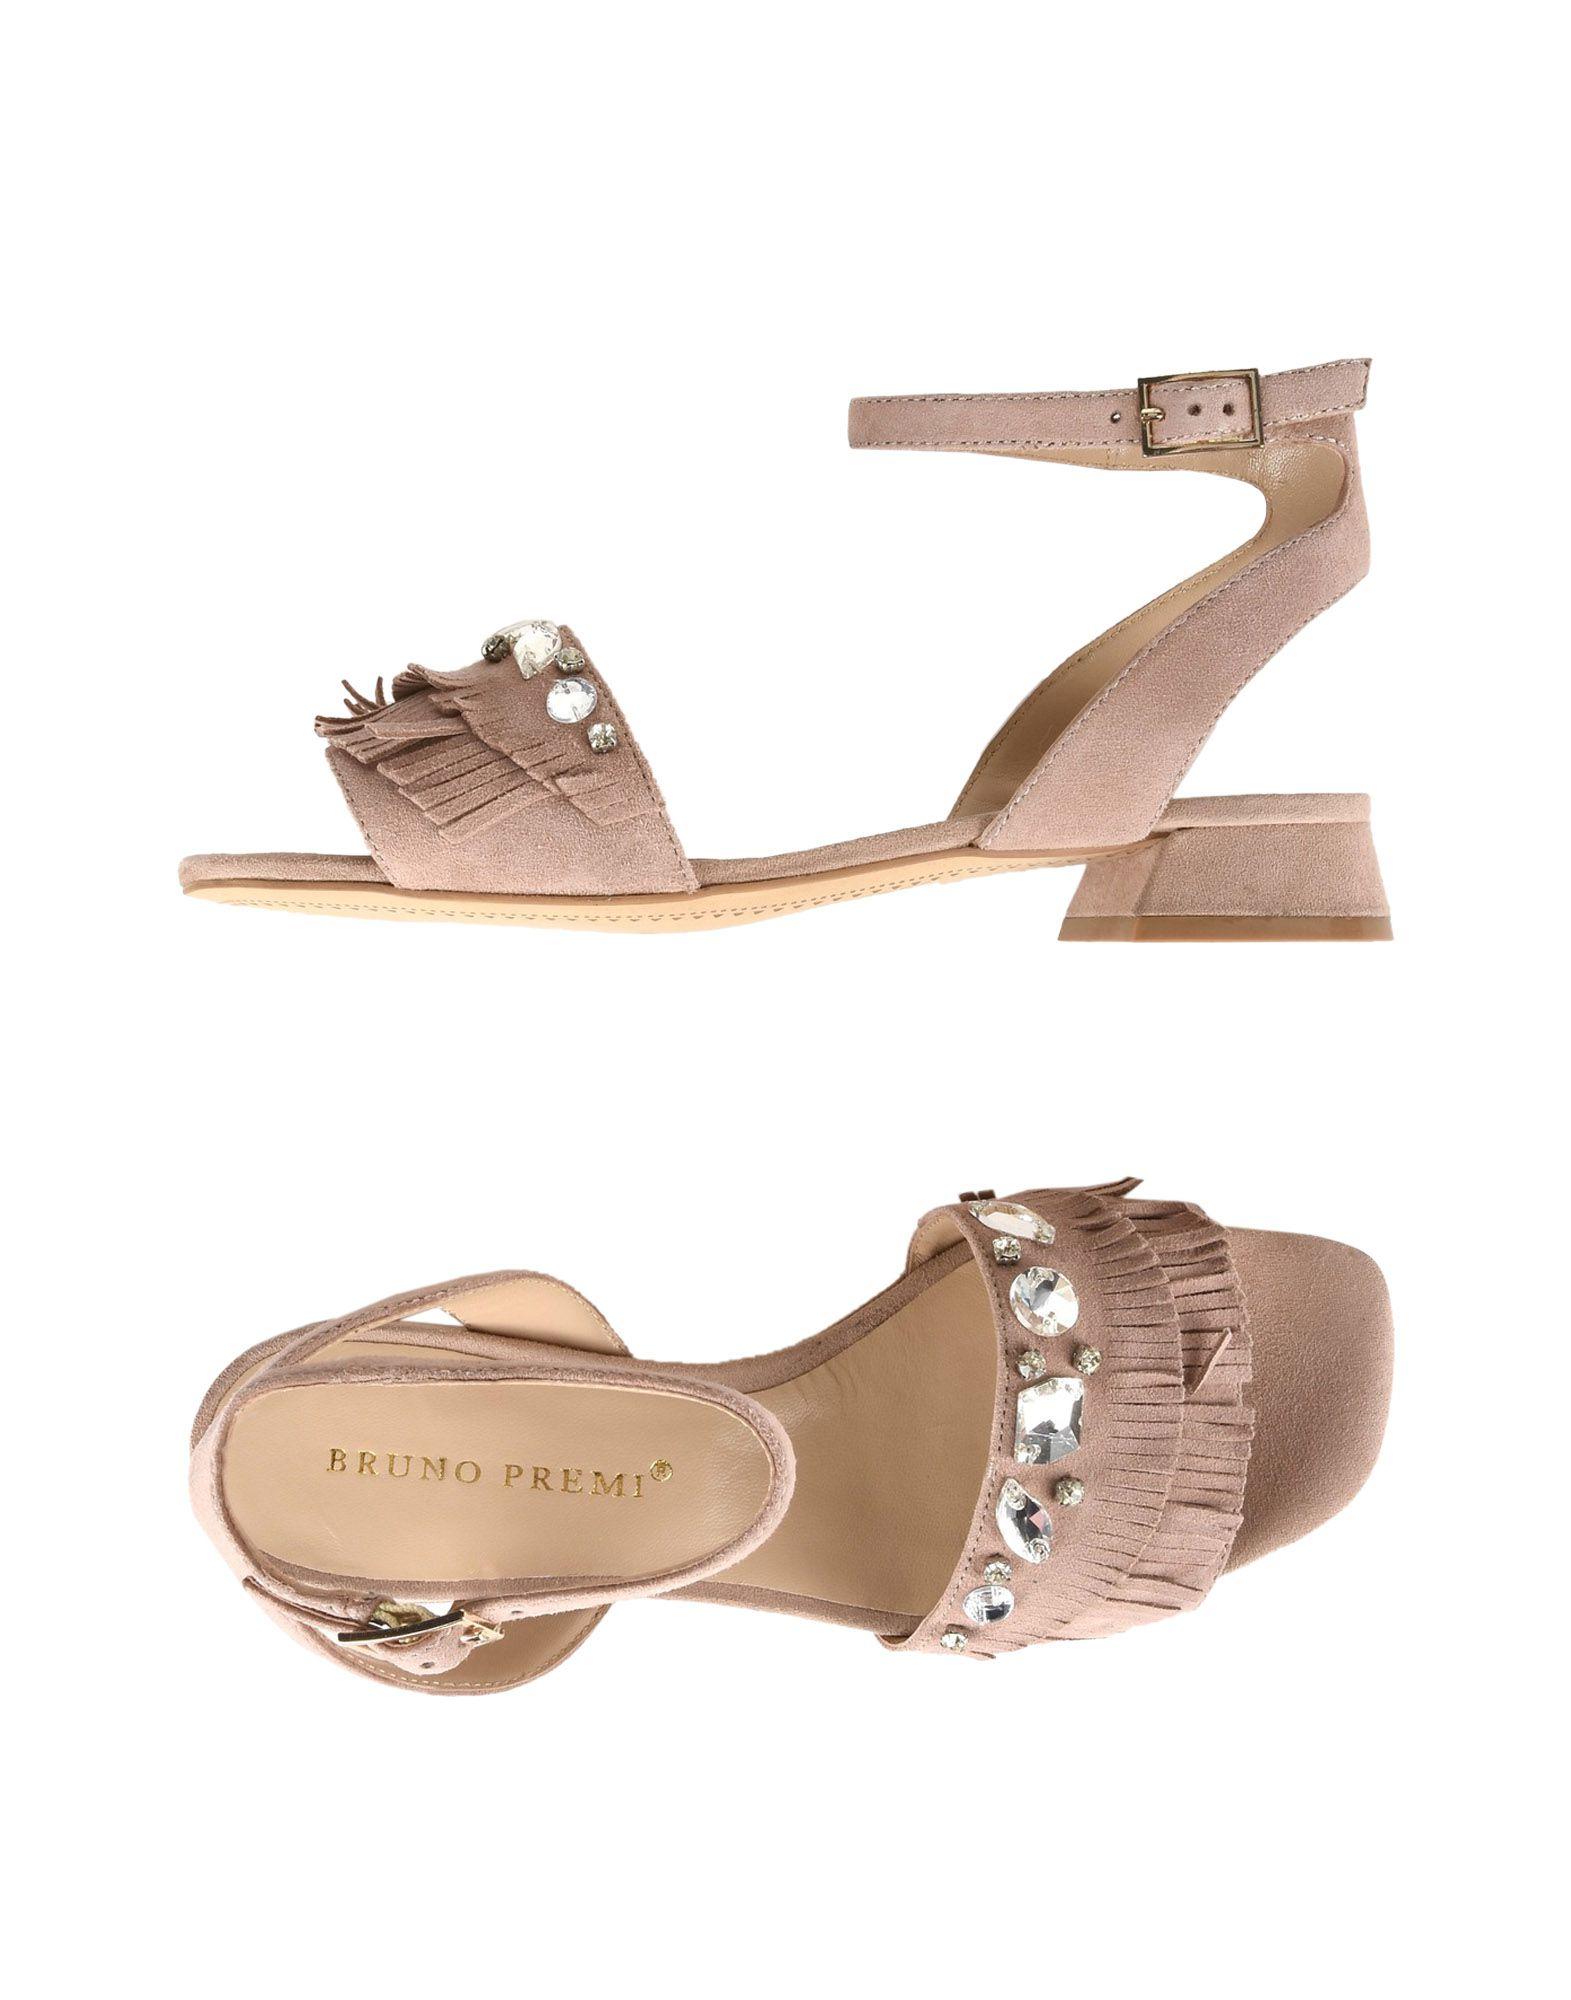 Bruno Premi Sandals - Women Bruno Premi Sandals - online on  Australia - Sandals 11463547HW 5c1985